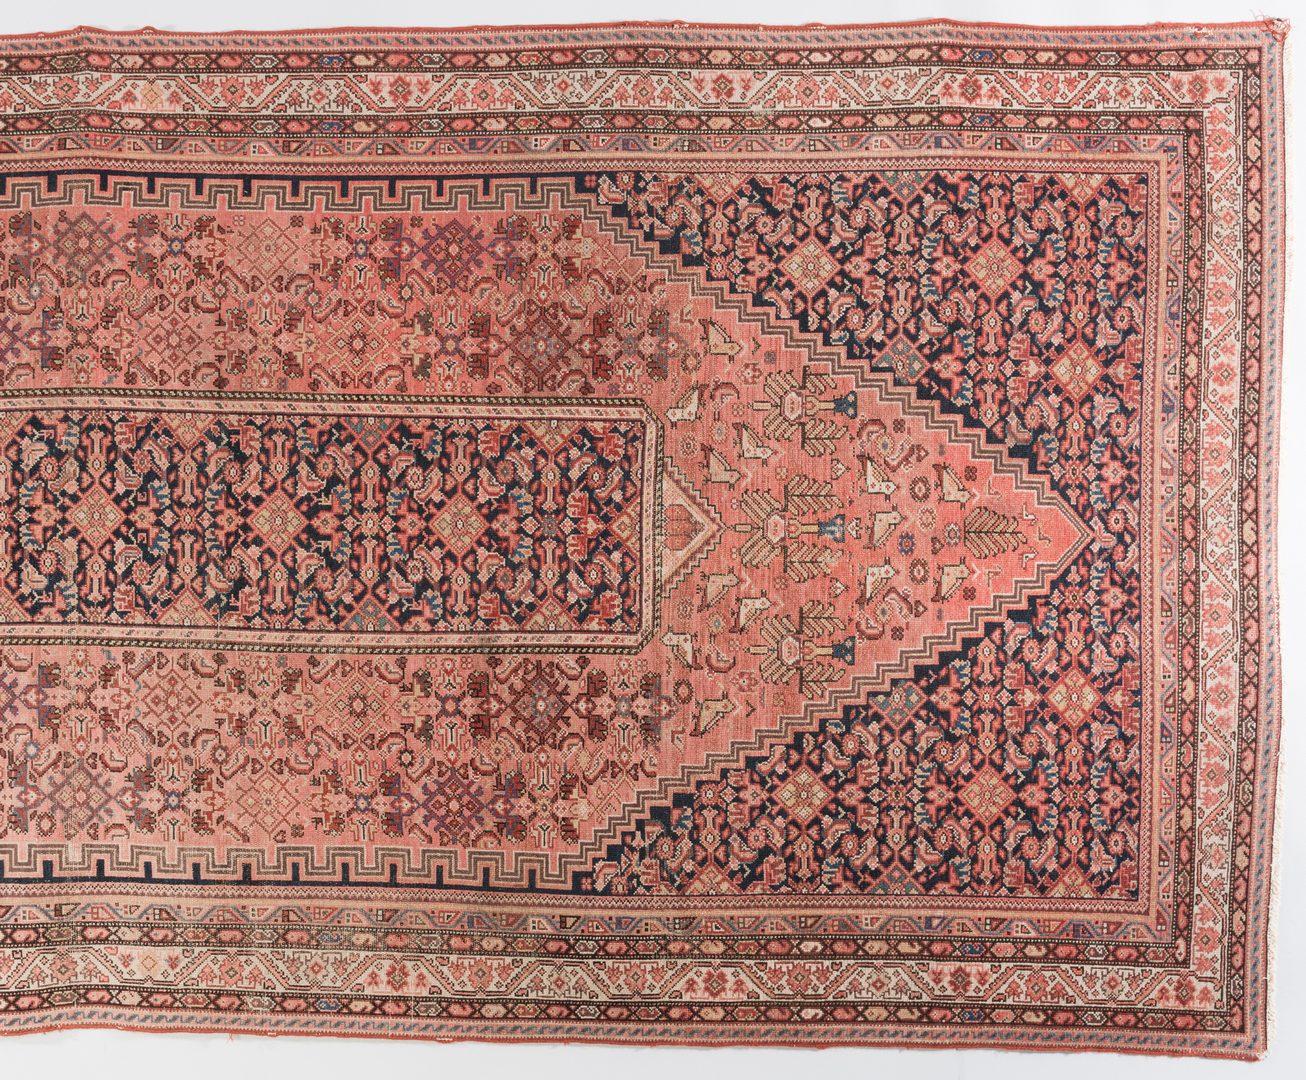 Lot 302: Antique Persian Hall Rug